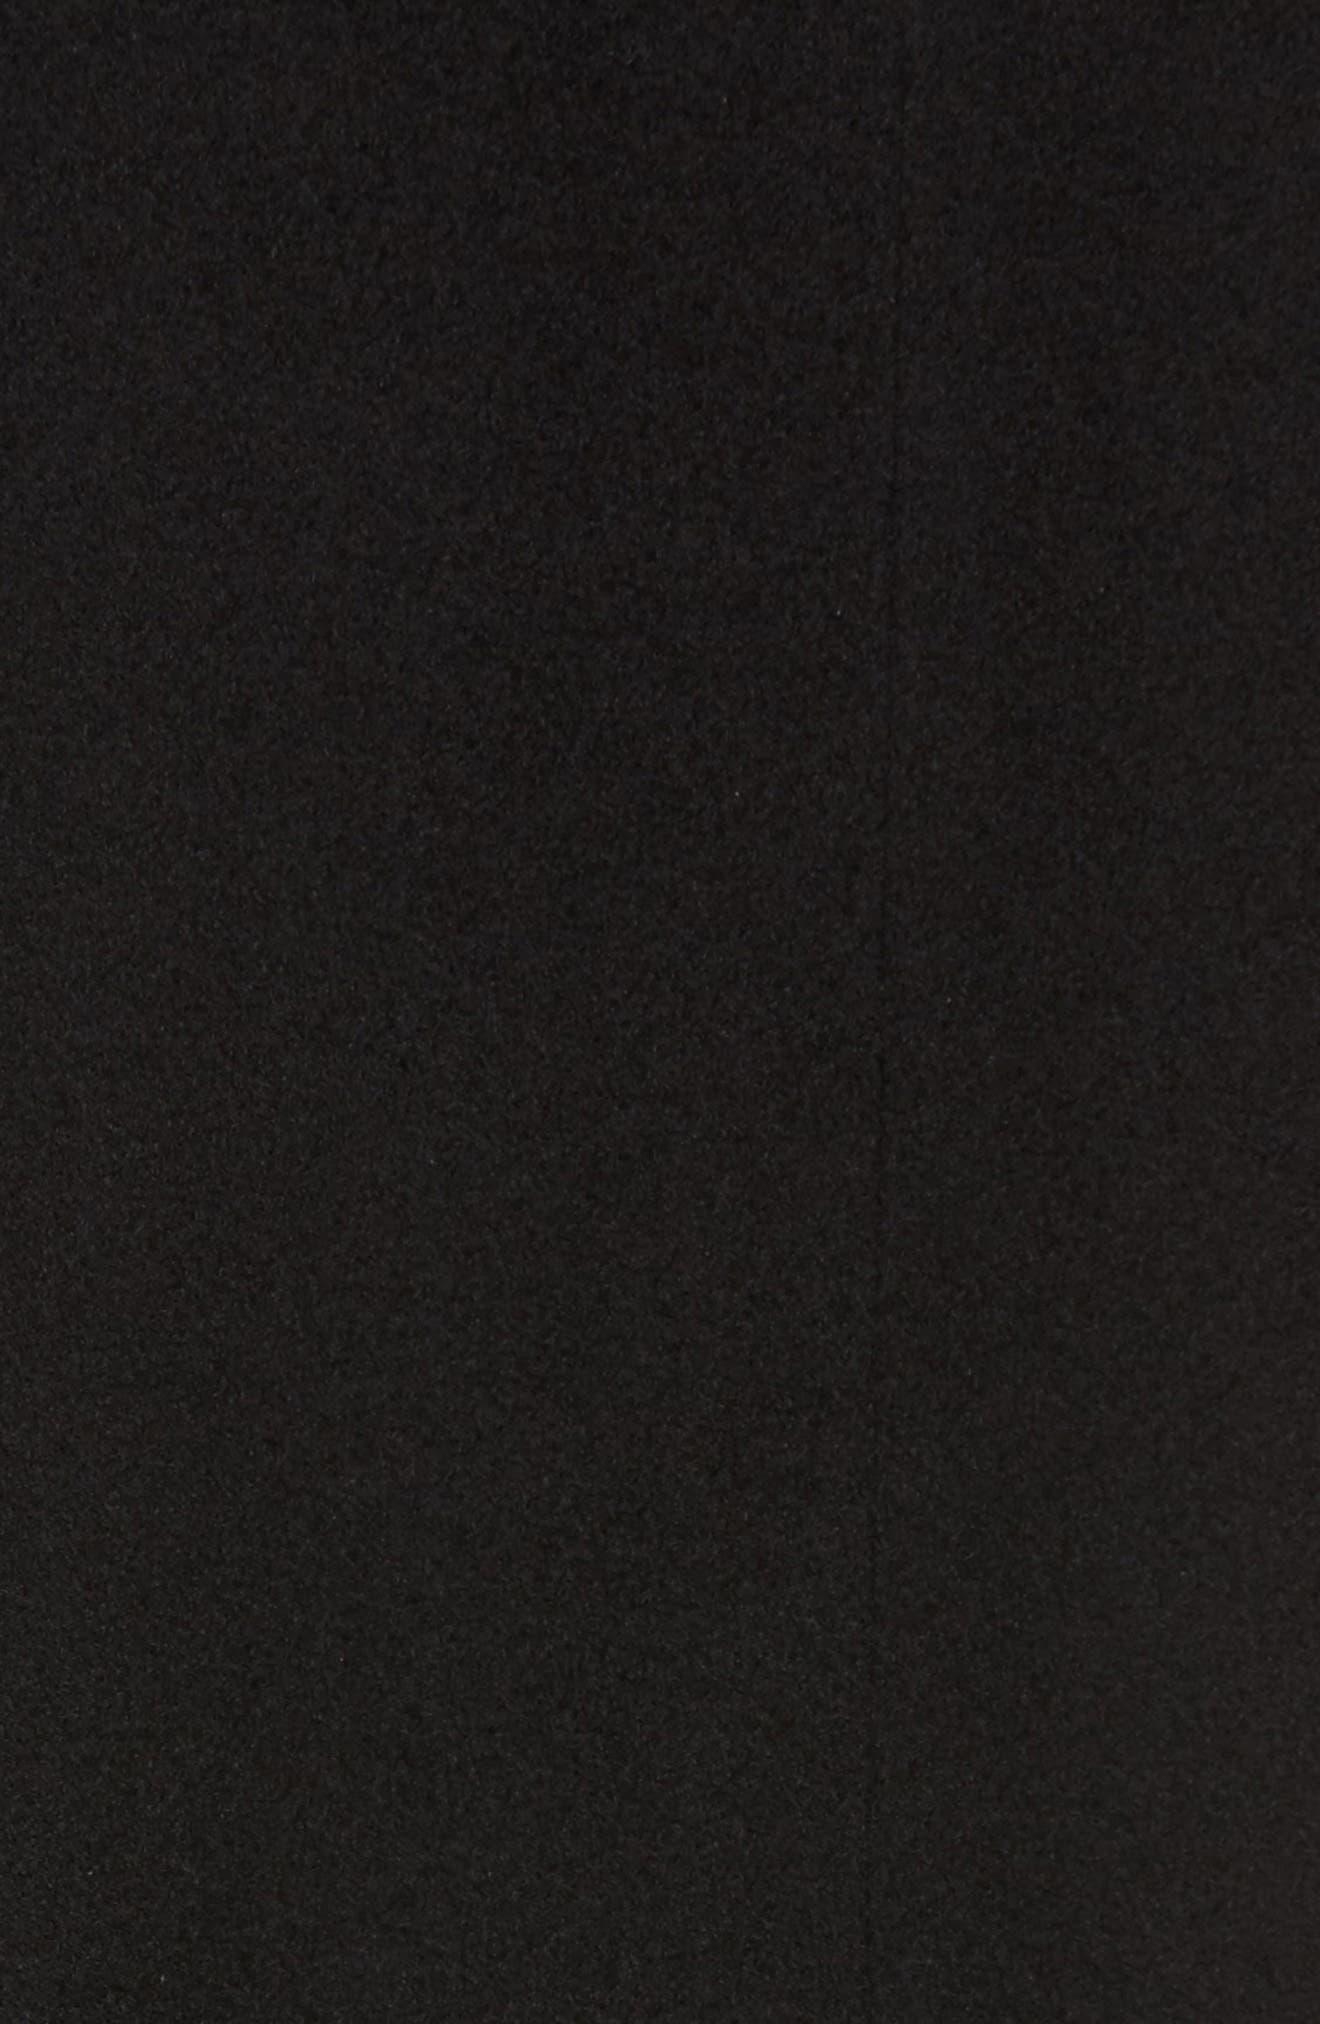 Loro Piana Wool Wing Collar Coat with Genuine Mink Trim,                             Alternate thumbnail 5, color,                             Black